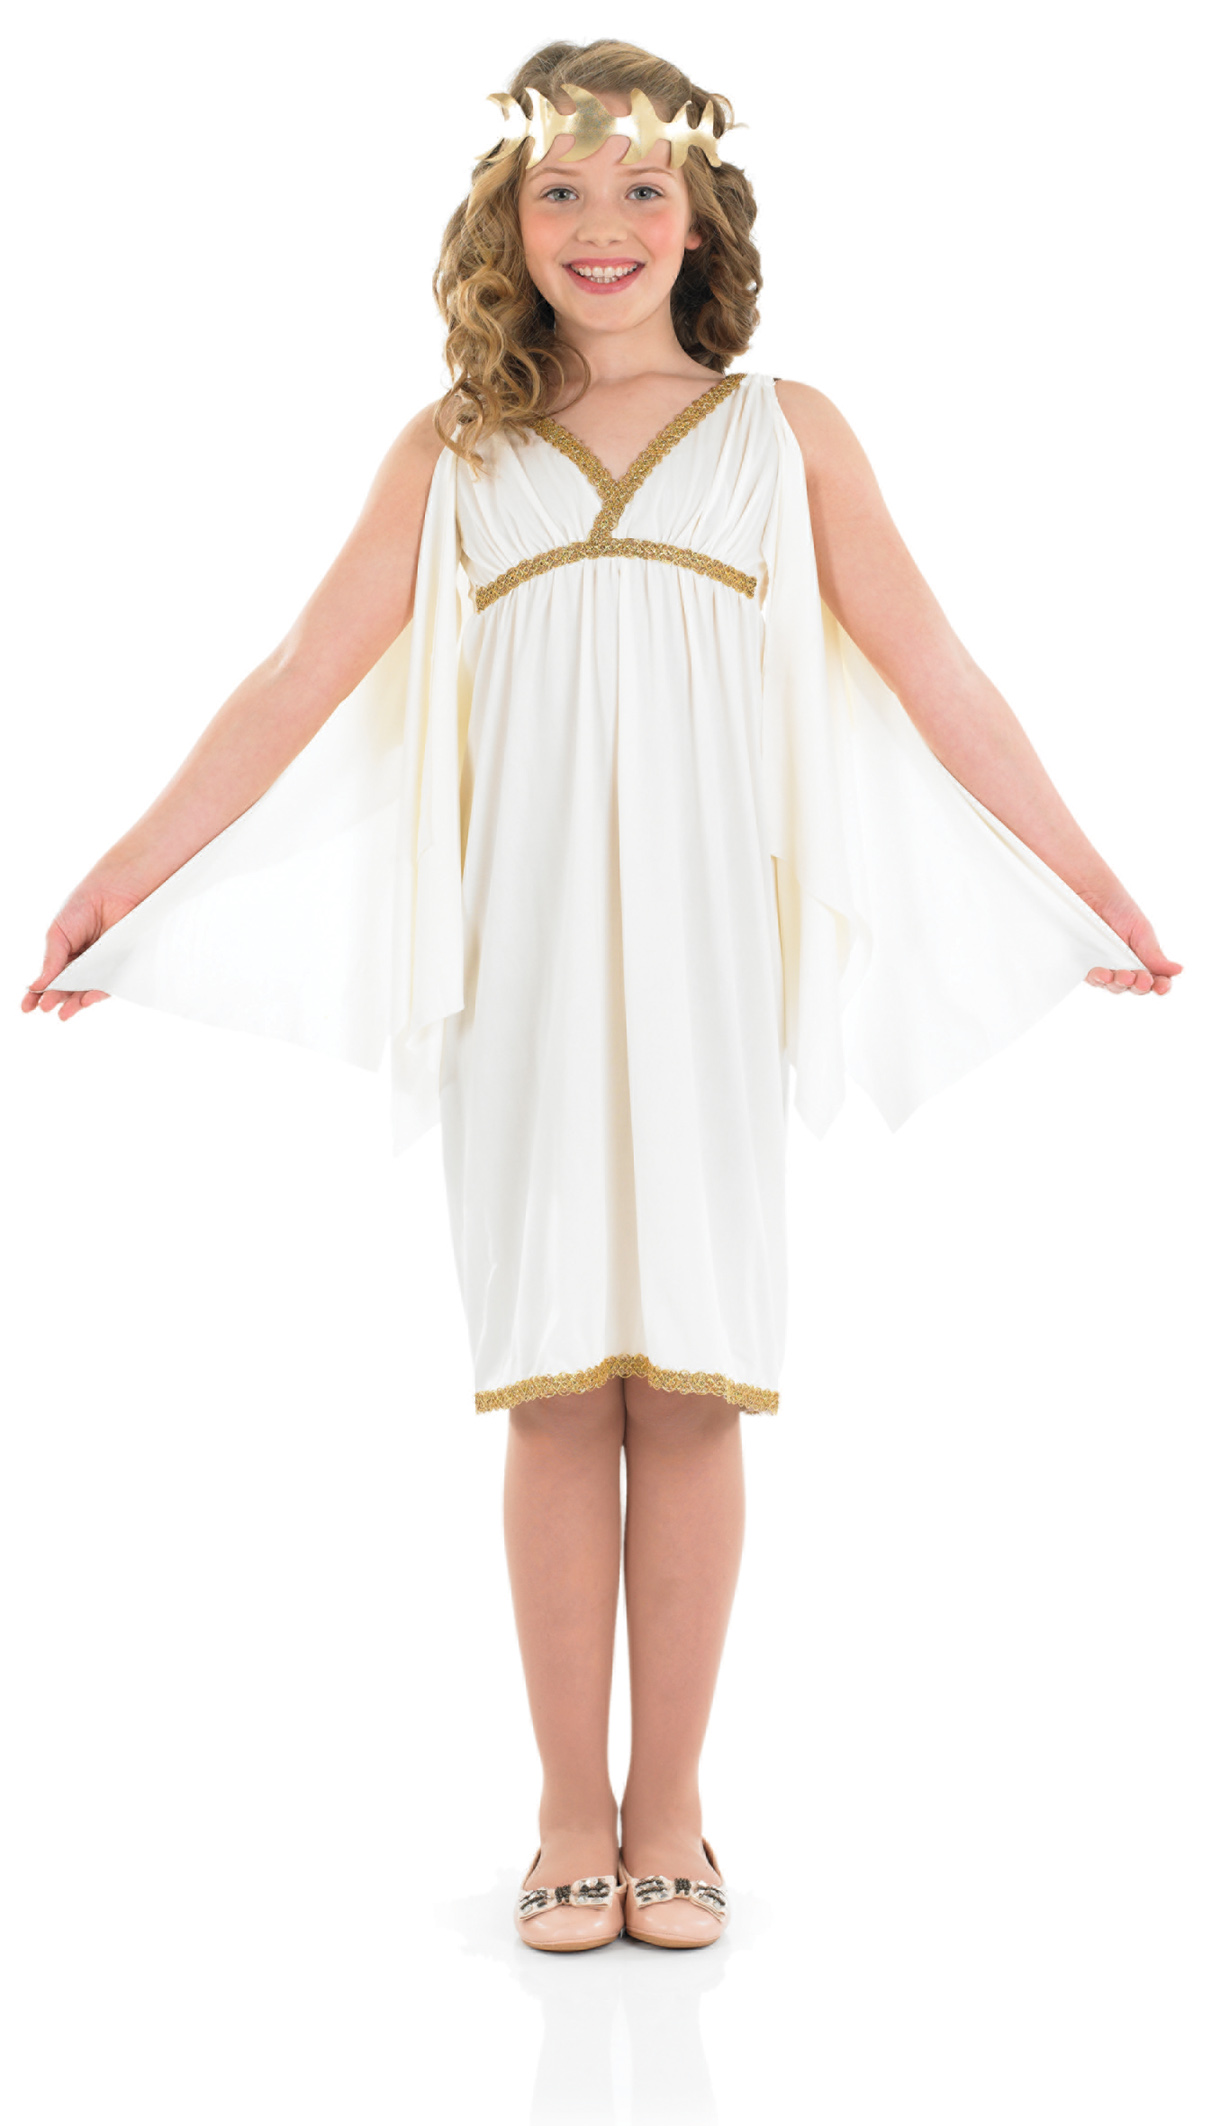 Cleopatra Girlsl Costume Ancient Egypt Kids Egyptian Fancy Dress